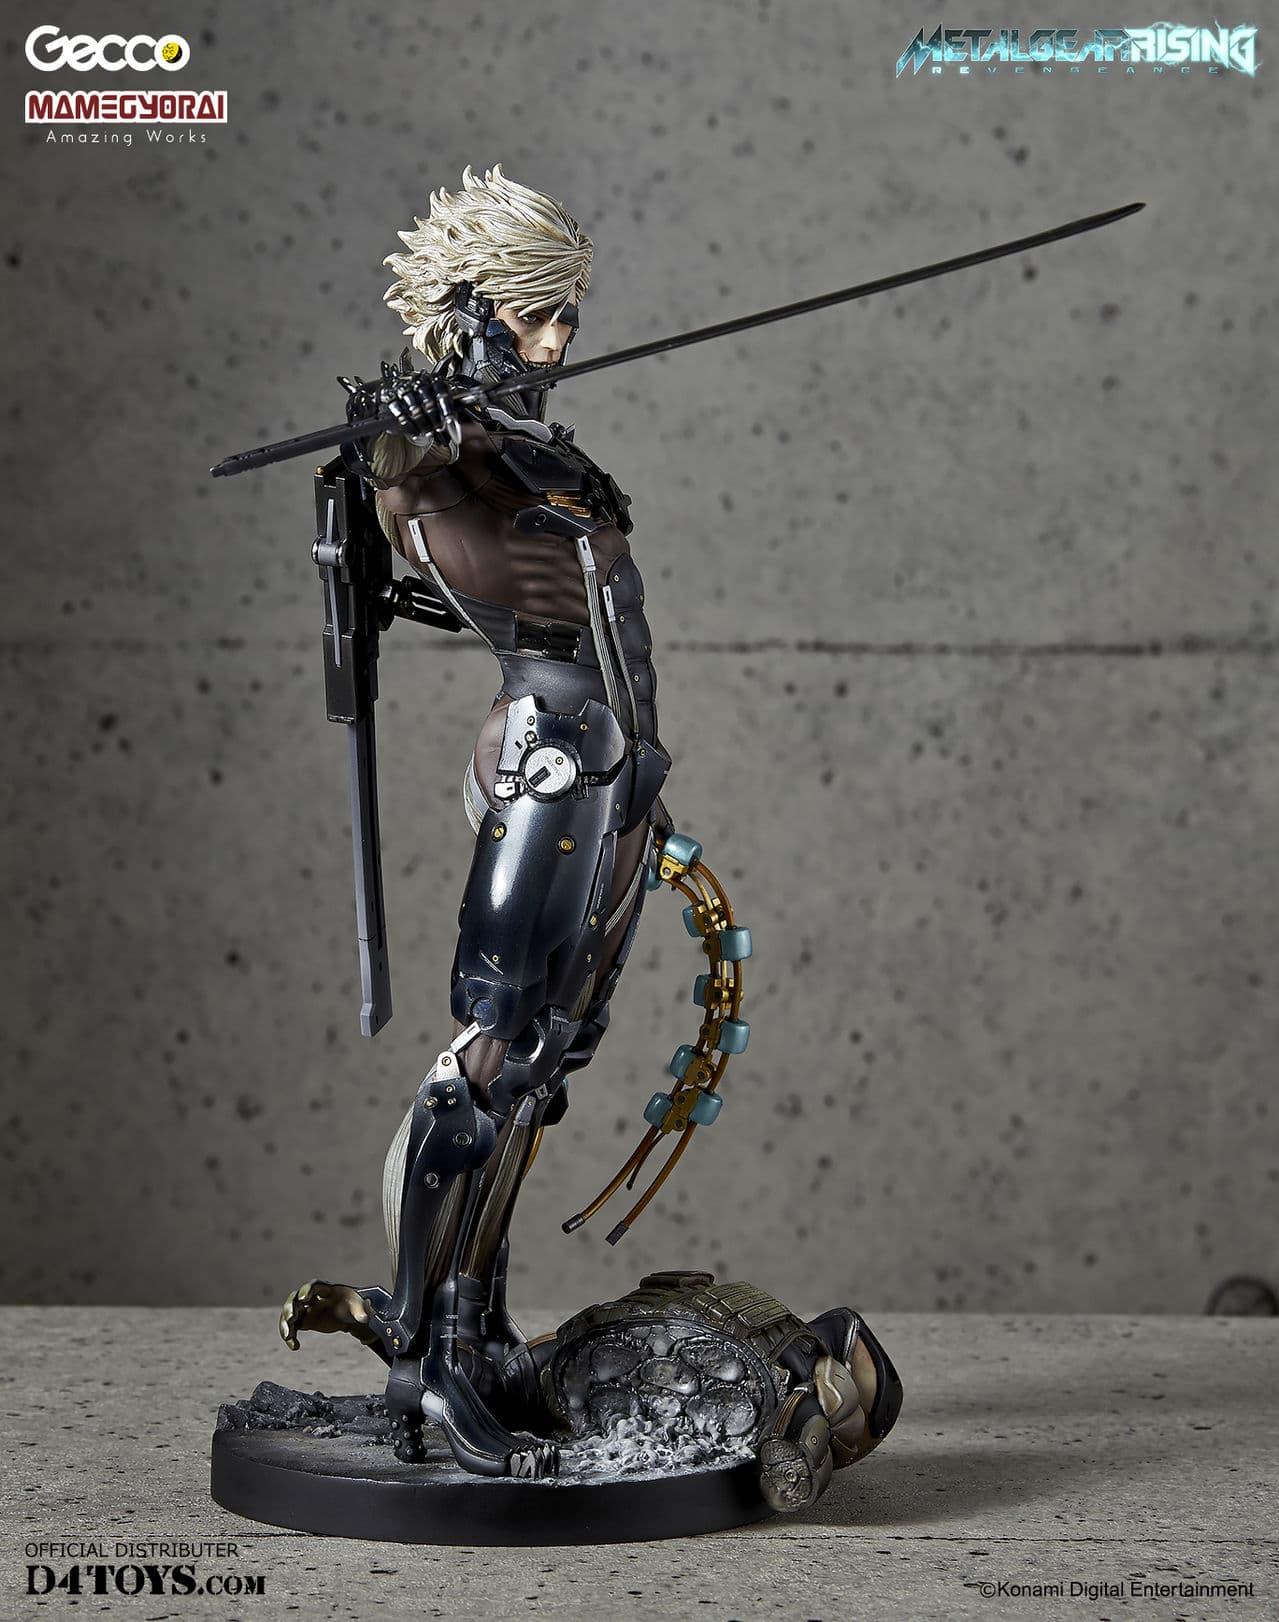 [Gecco,  Mamegyorai] Metal Gear Rising: Revengeance - RAIDEN White Armor 1/6 - SDCC2015 Exclusive - Página 2 D4_010